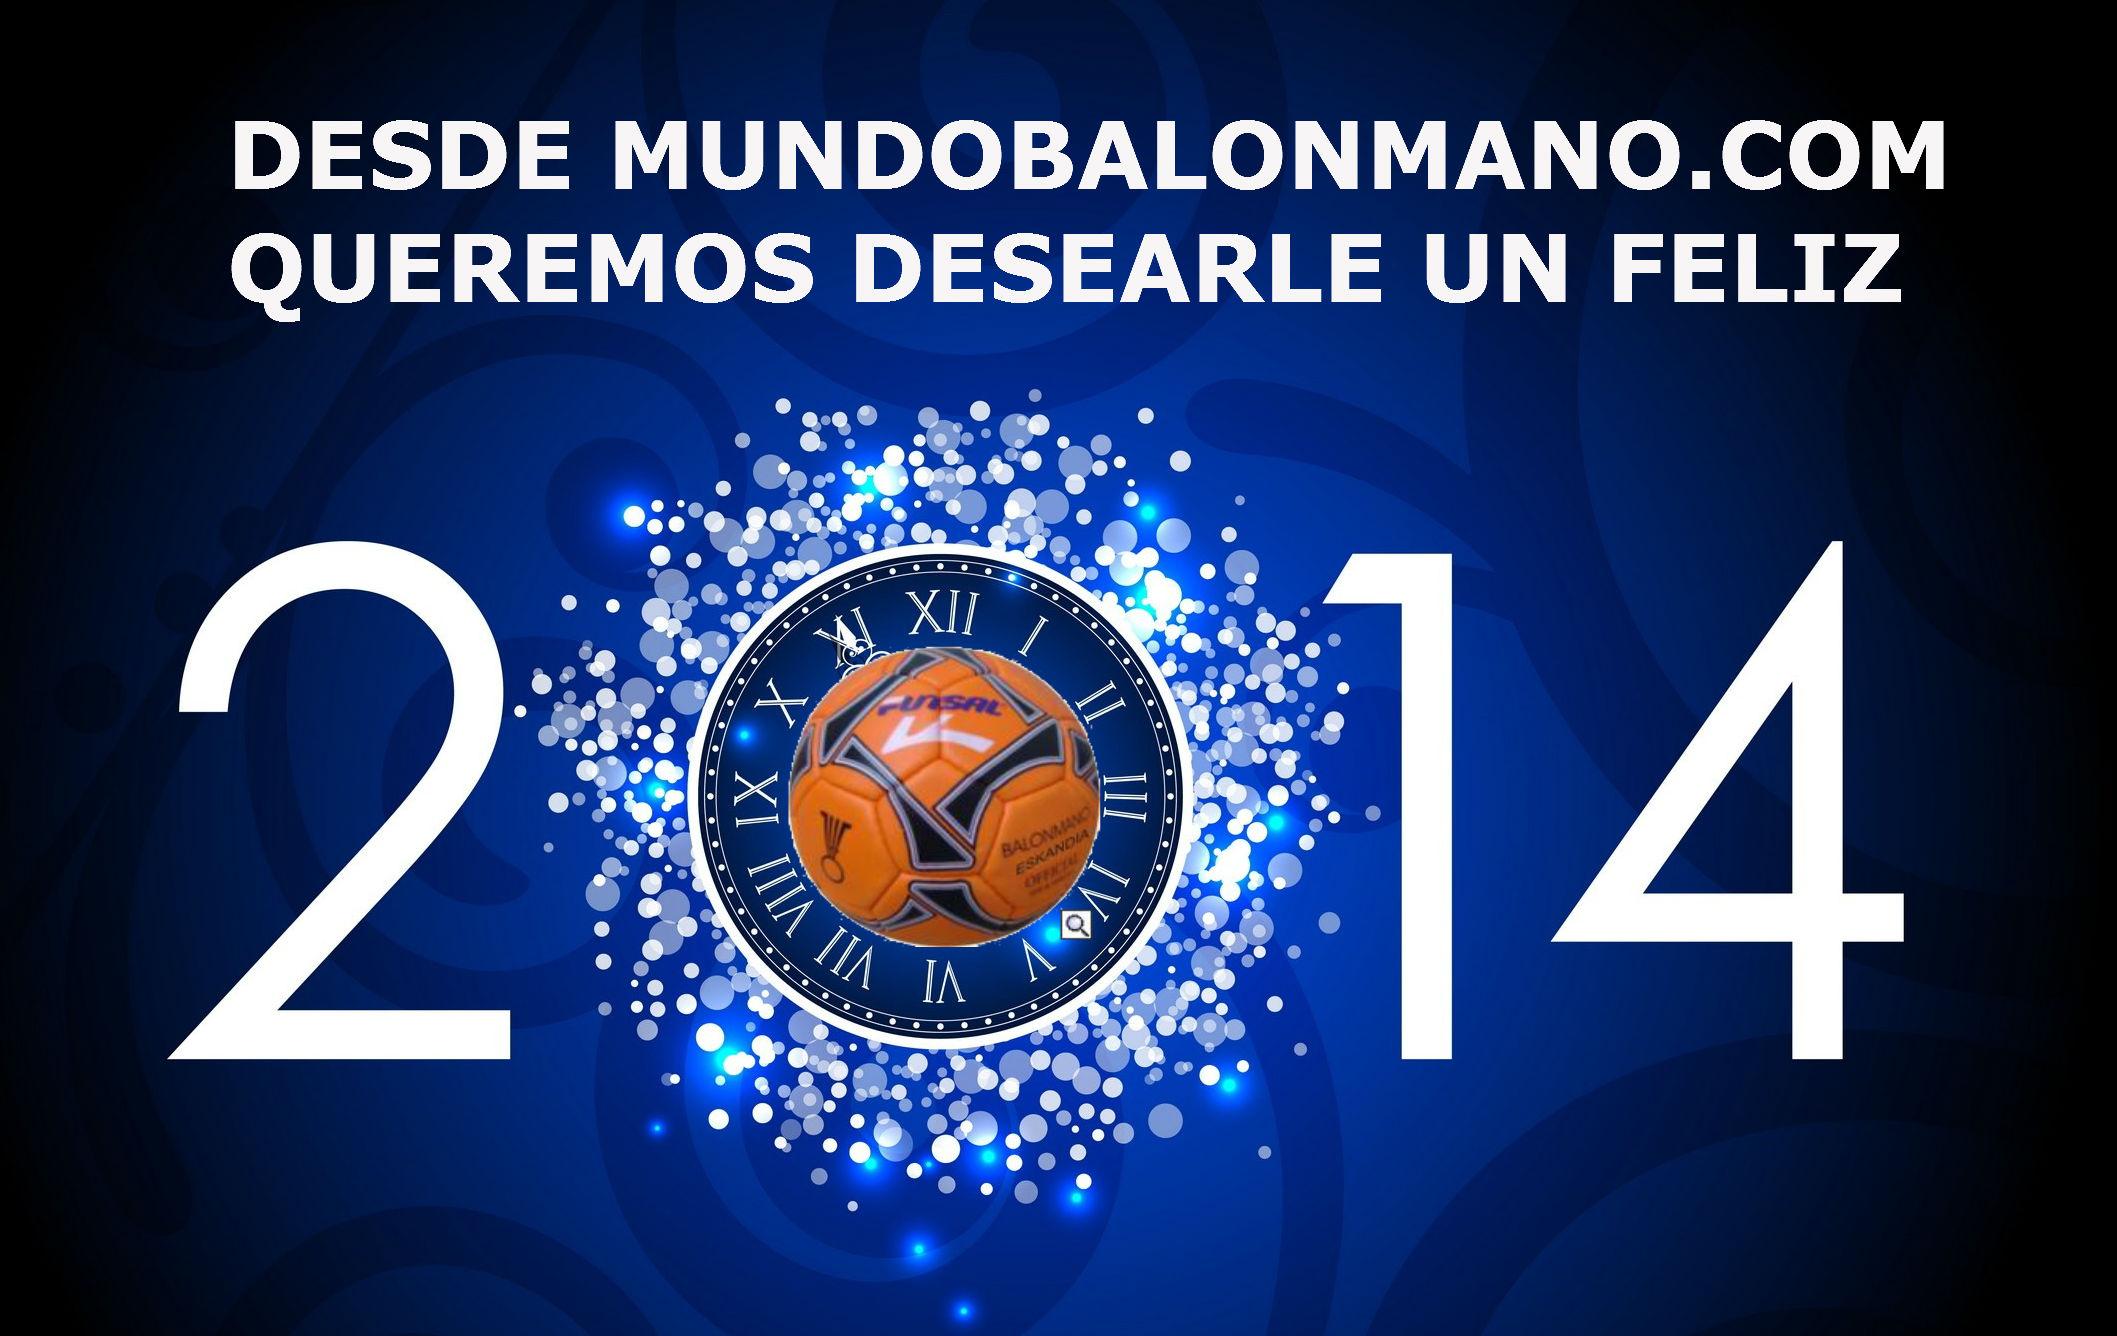 MUNDOBALONMANO.COM-FELIZ-2014